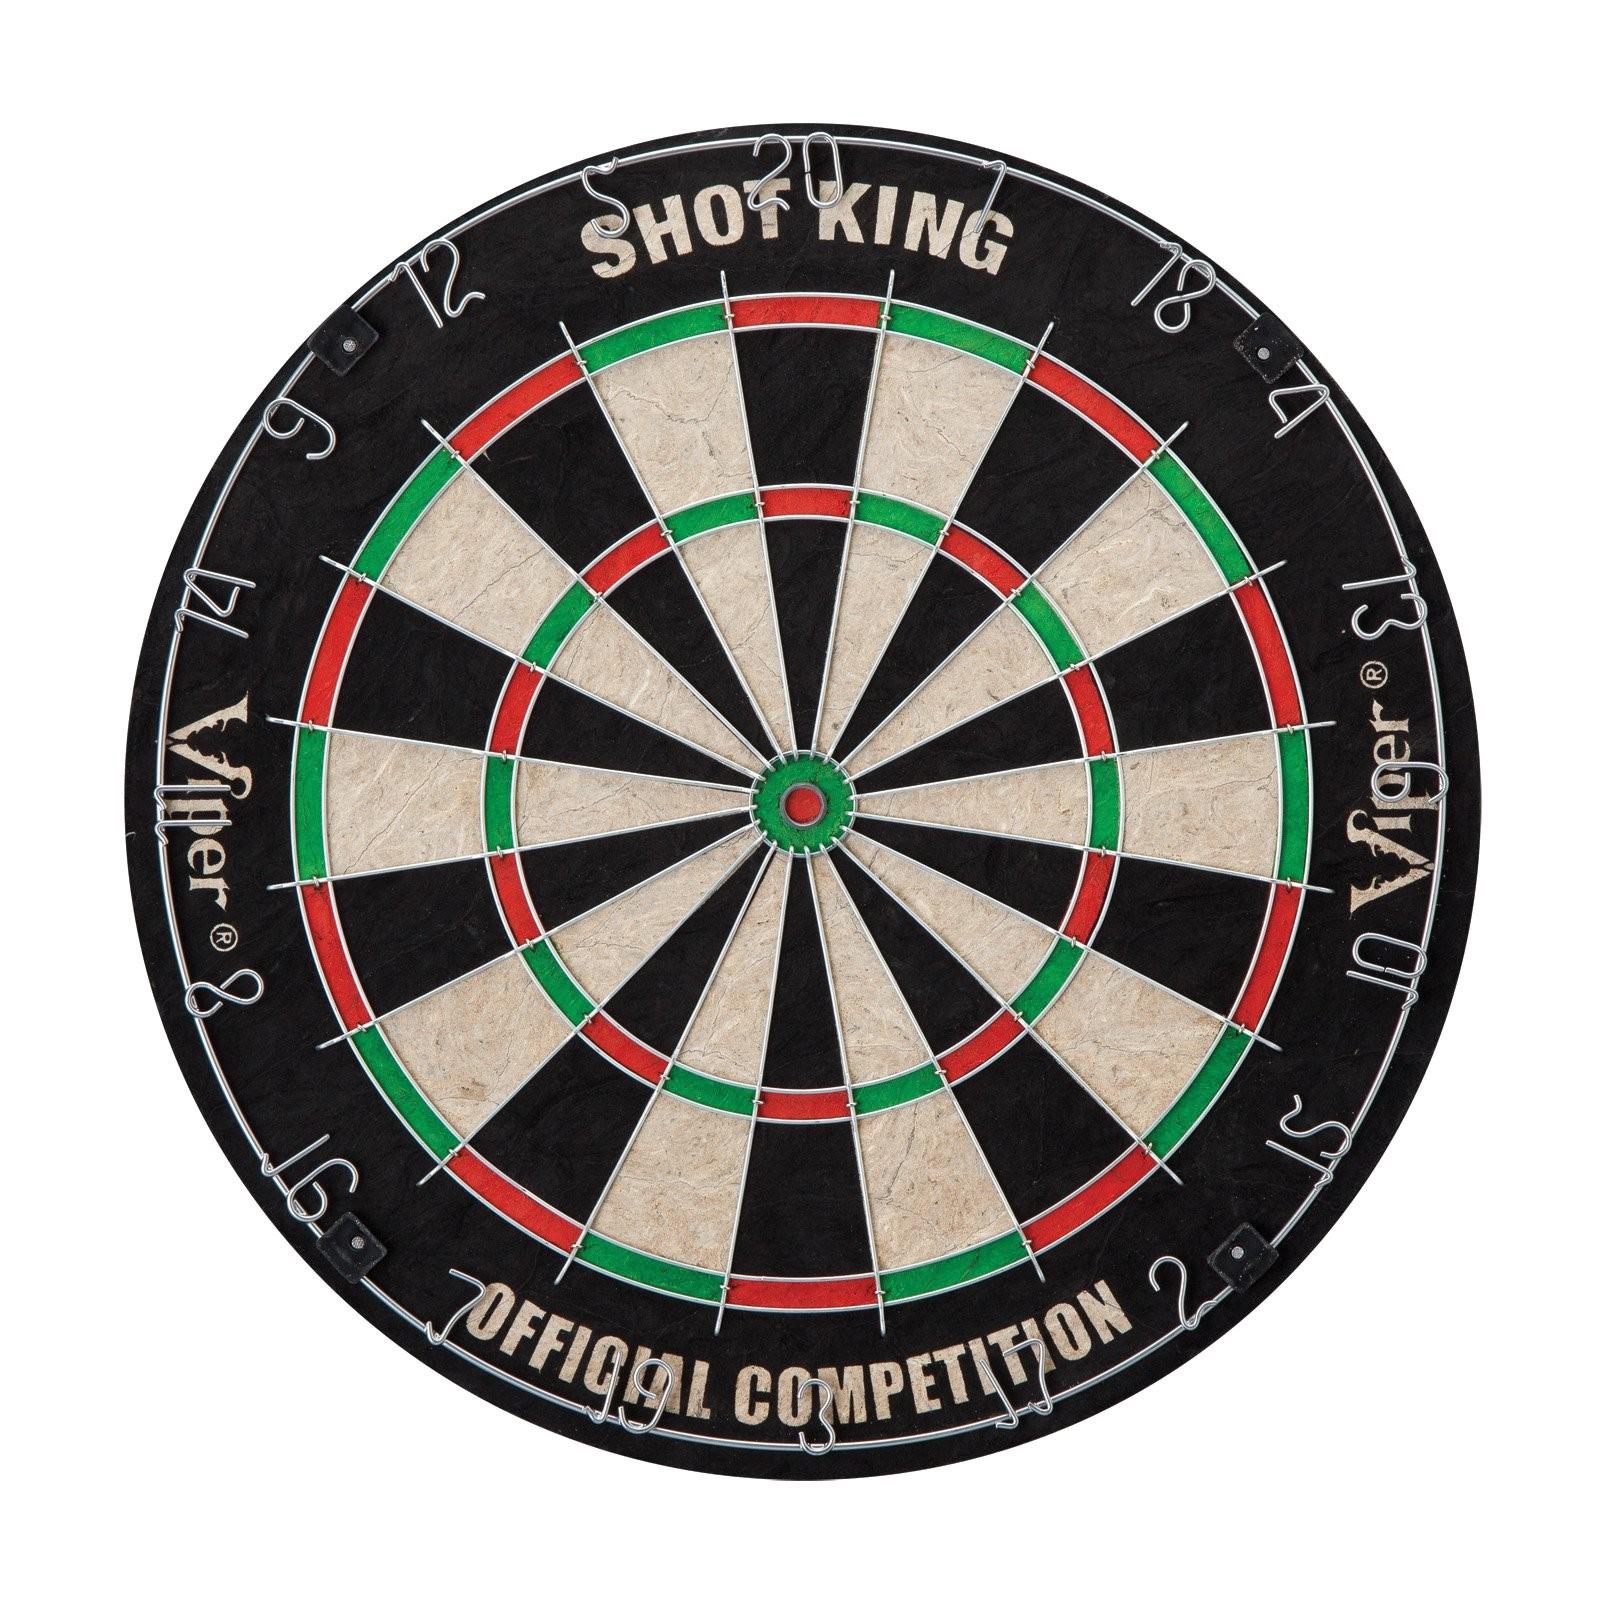 What are Dart Boards Made Of Viper Shot King Bristle Dart Board and Darts Set Dart